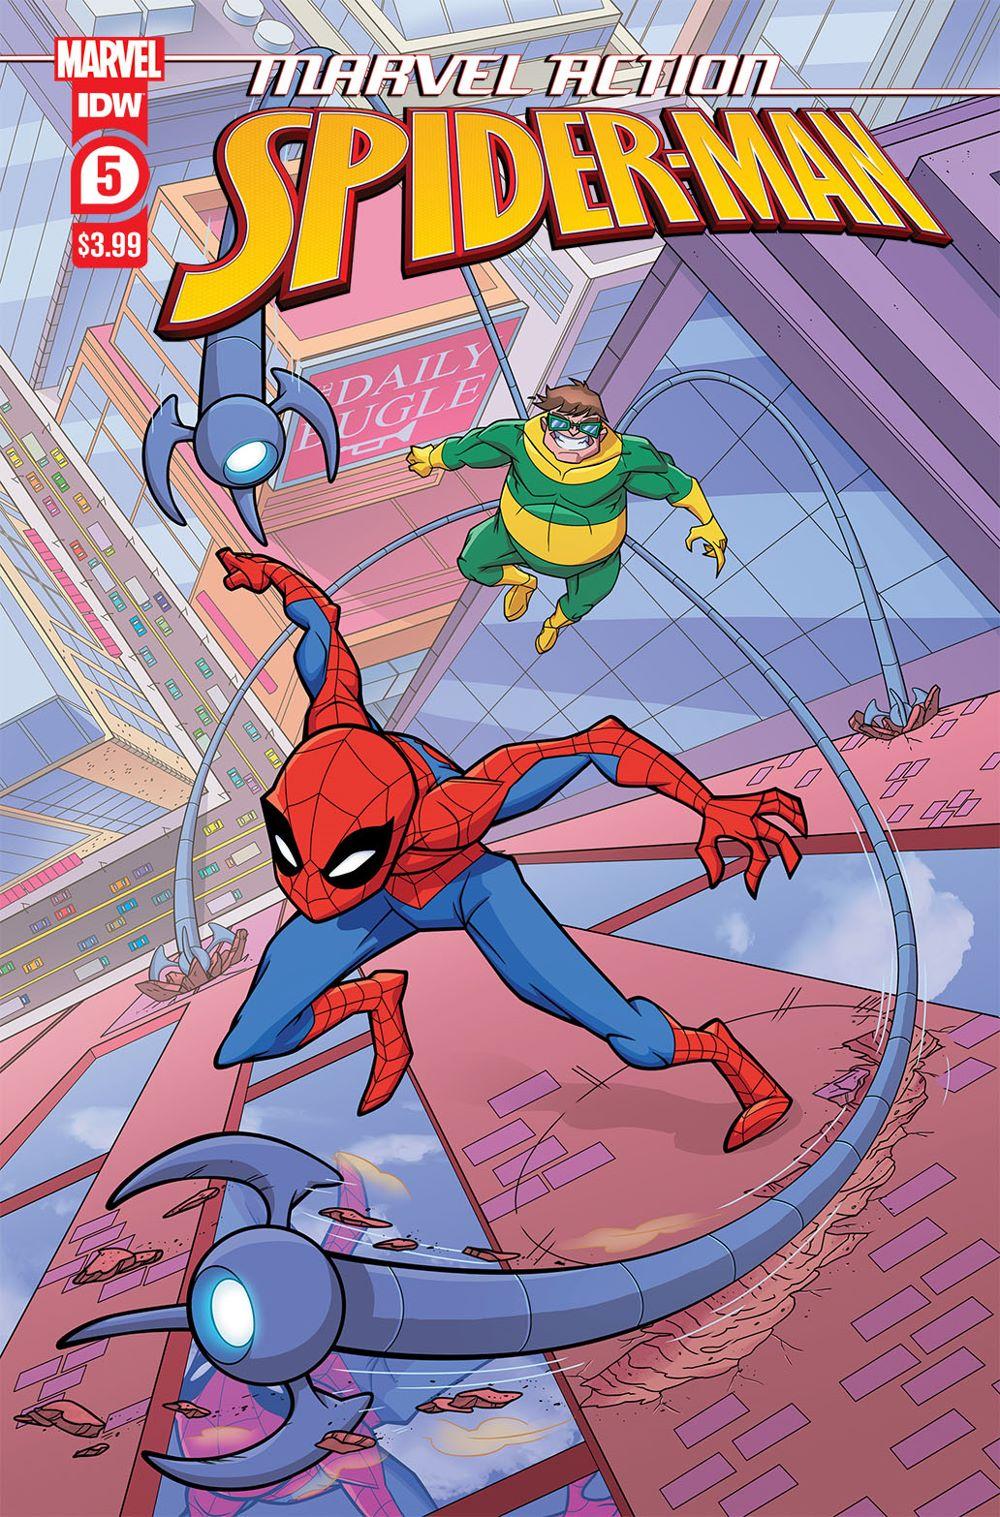 SpidermanV3-05_cvrA-copy IDW Publishing August 2021 Solicitations